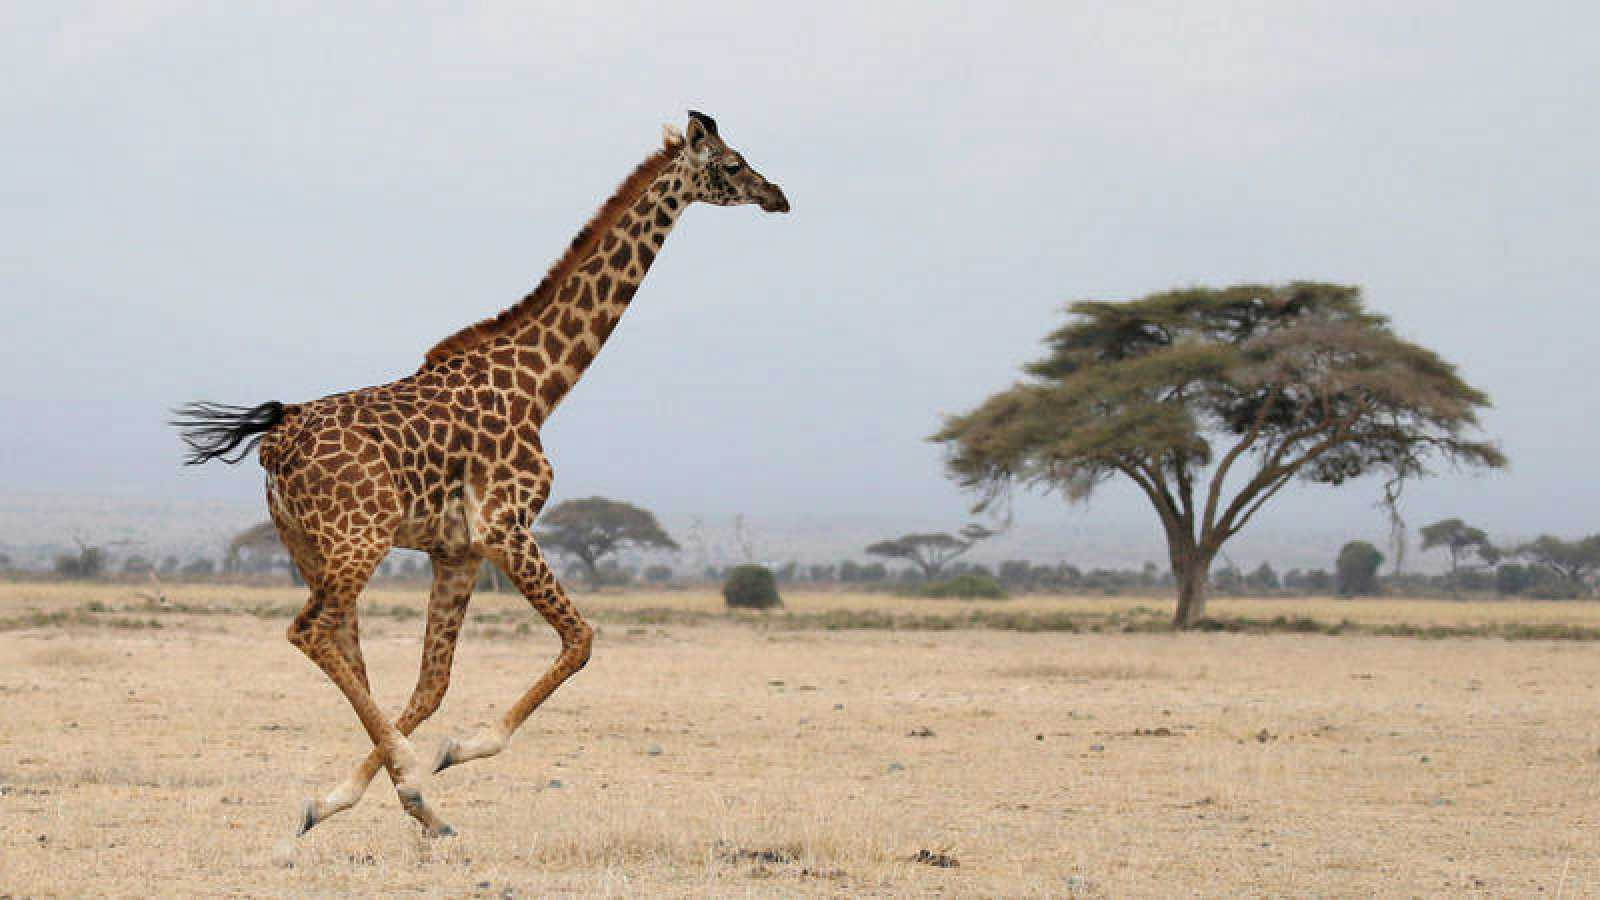 Una jirafa fotografiada en el Parque Nacional Amboseli, Kenia